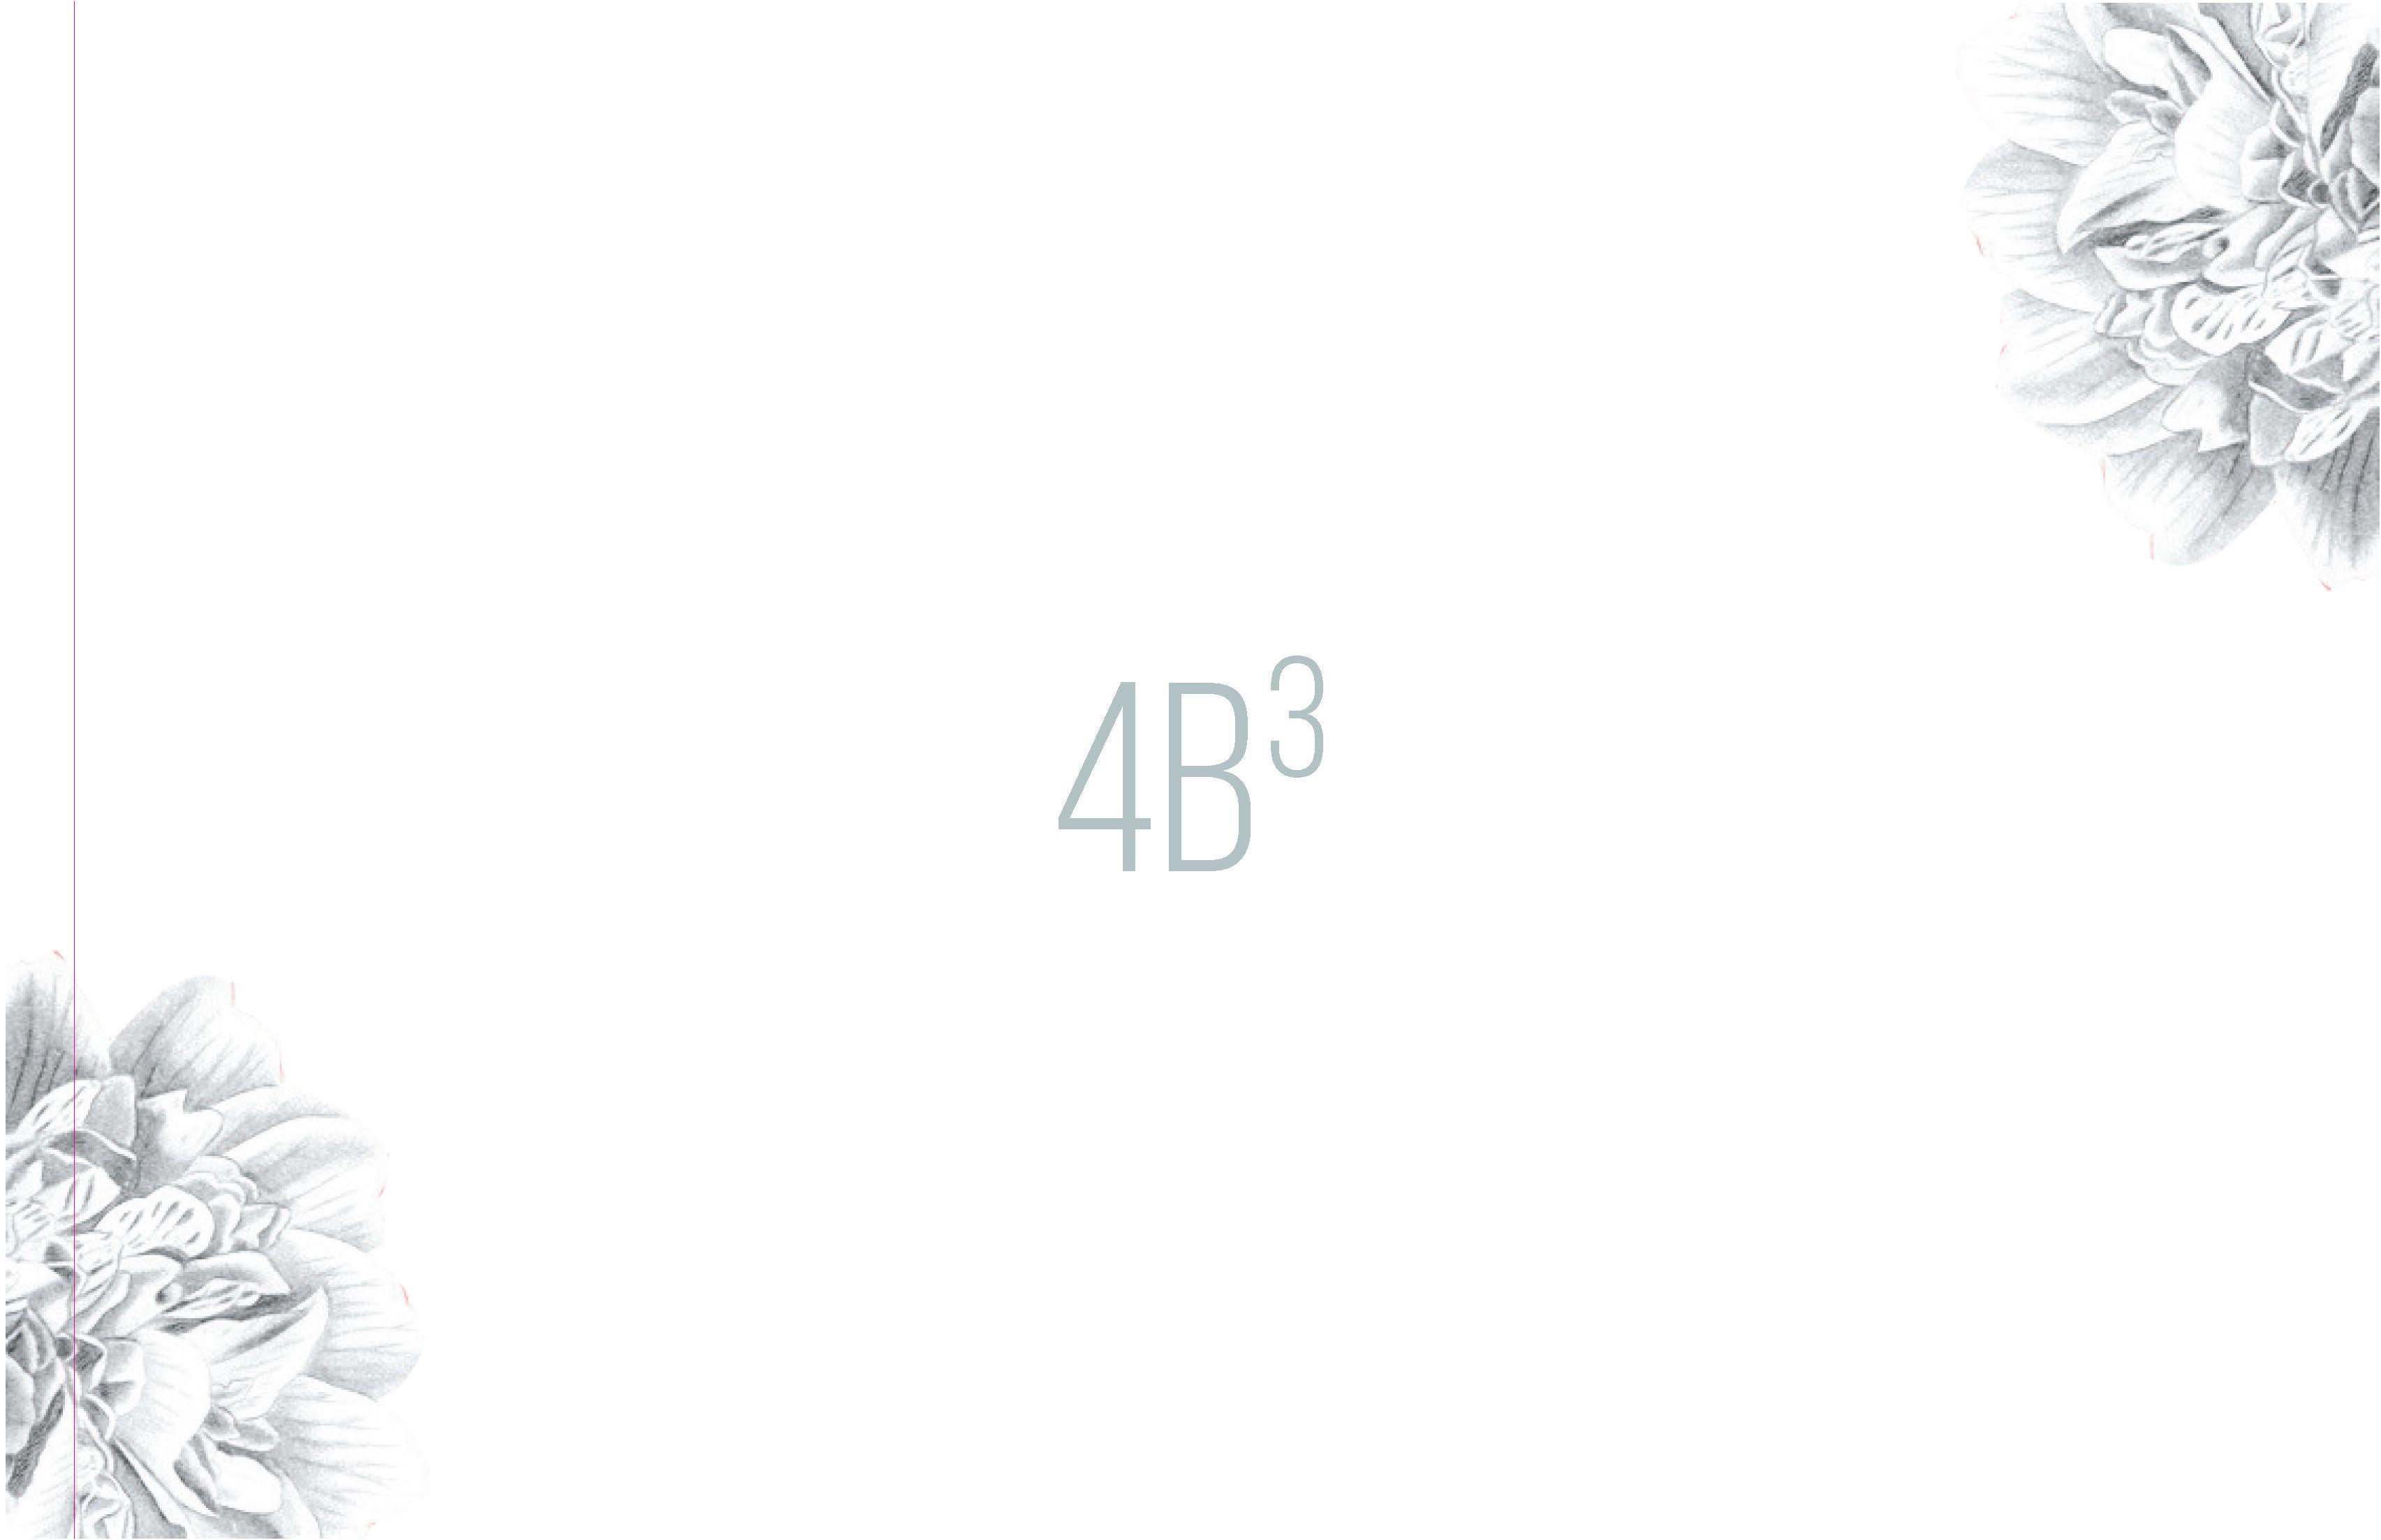 4B3 LOOKBOOK